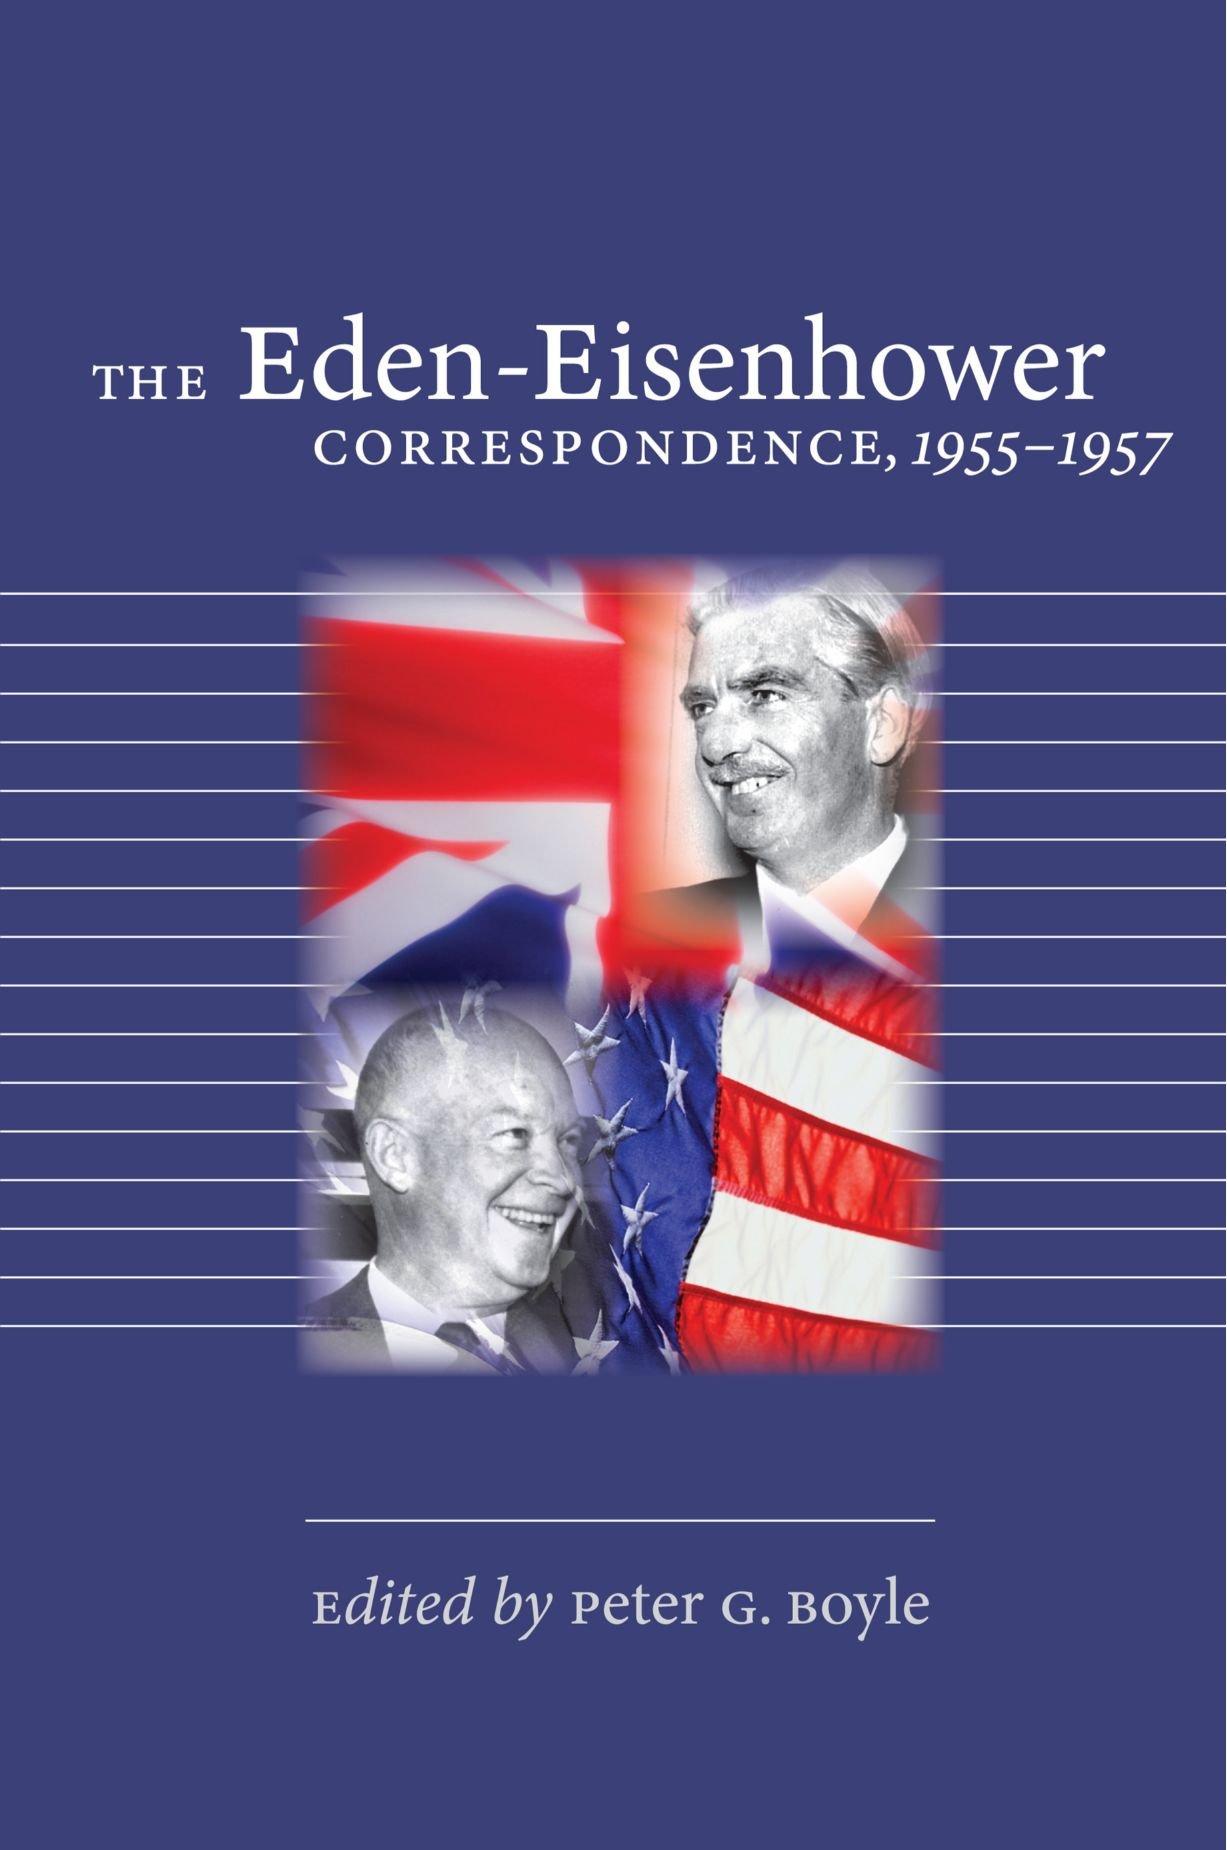 The Eden-Eisenhower Correspondence, 1955-1957 PDF